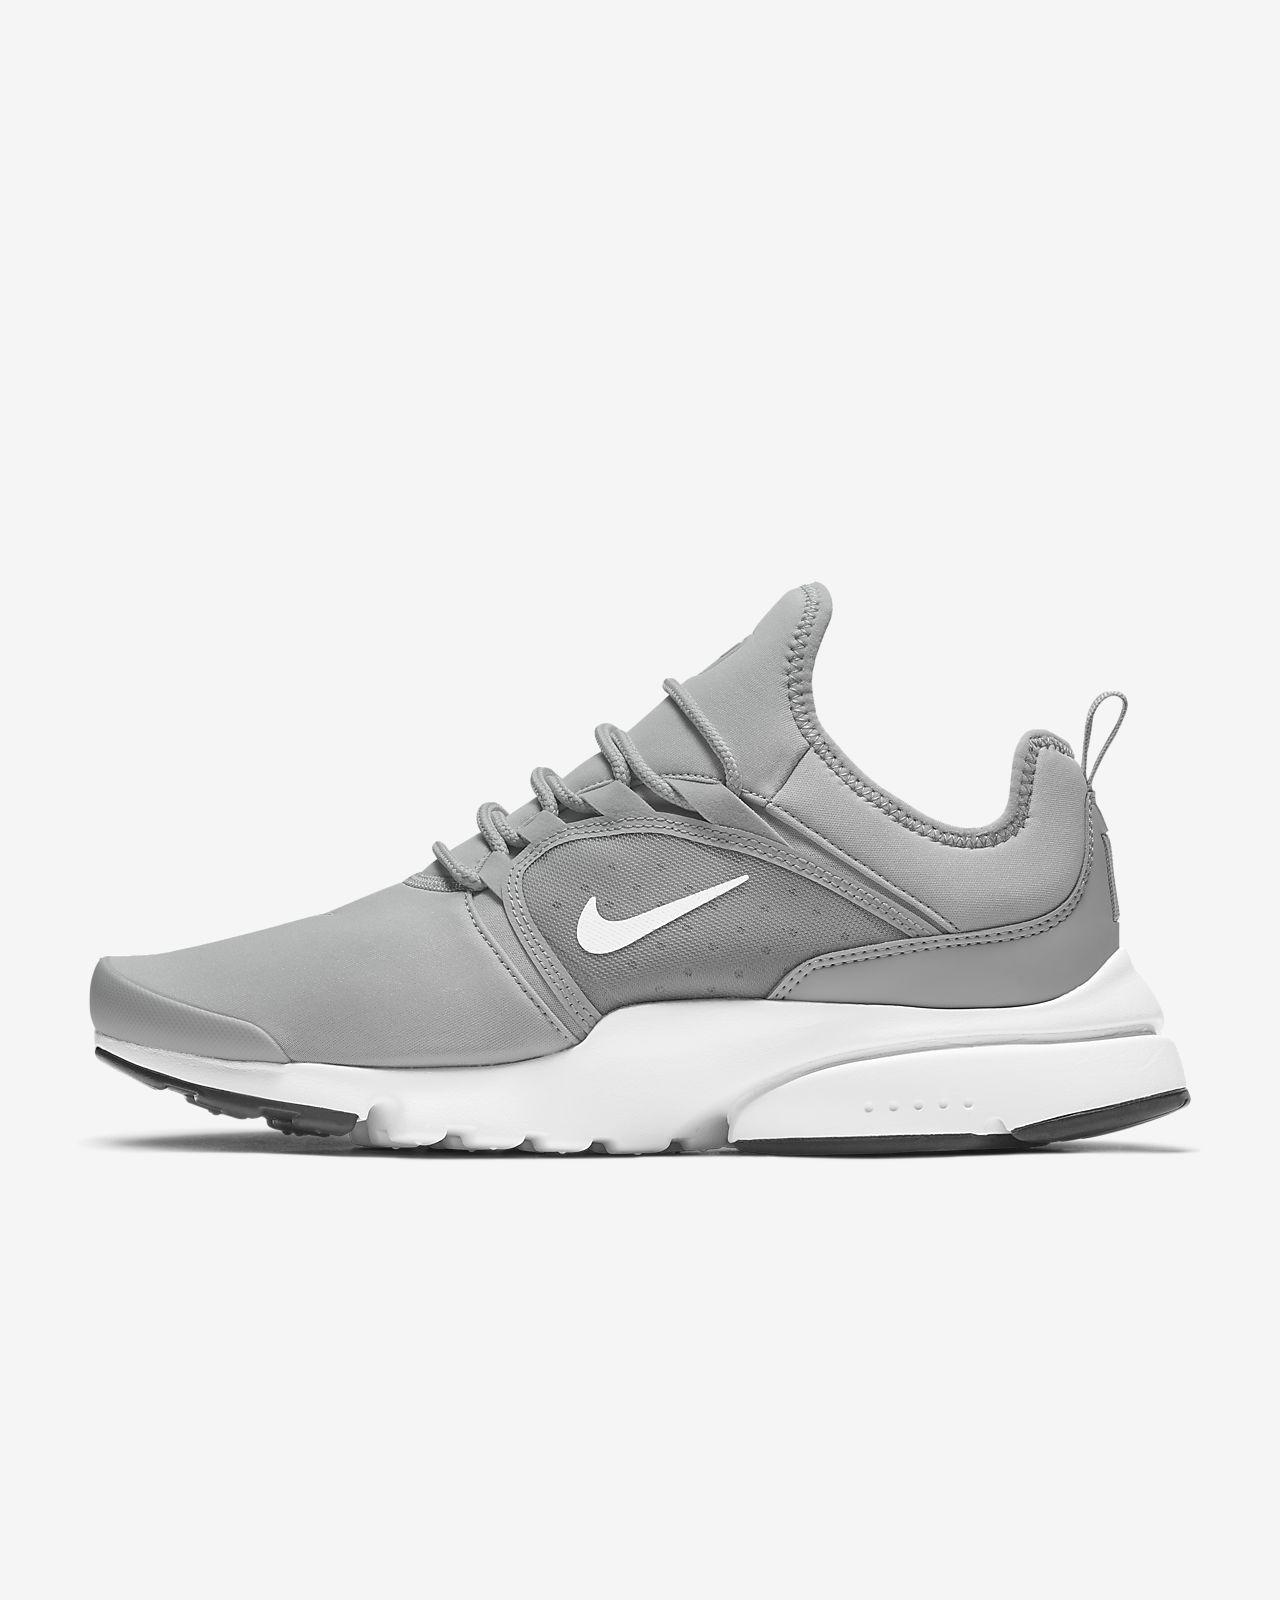 online store 534cf 15982 ... Scarpa Nike Presto Fly World - Uomo